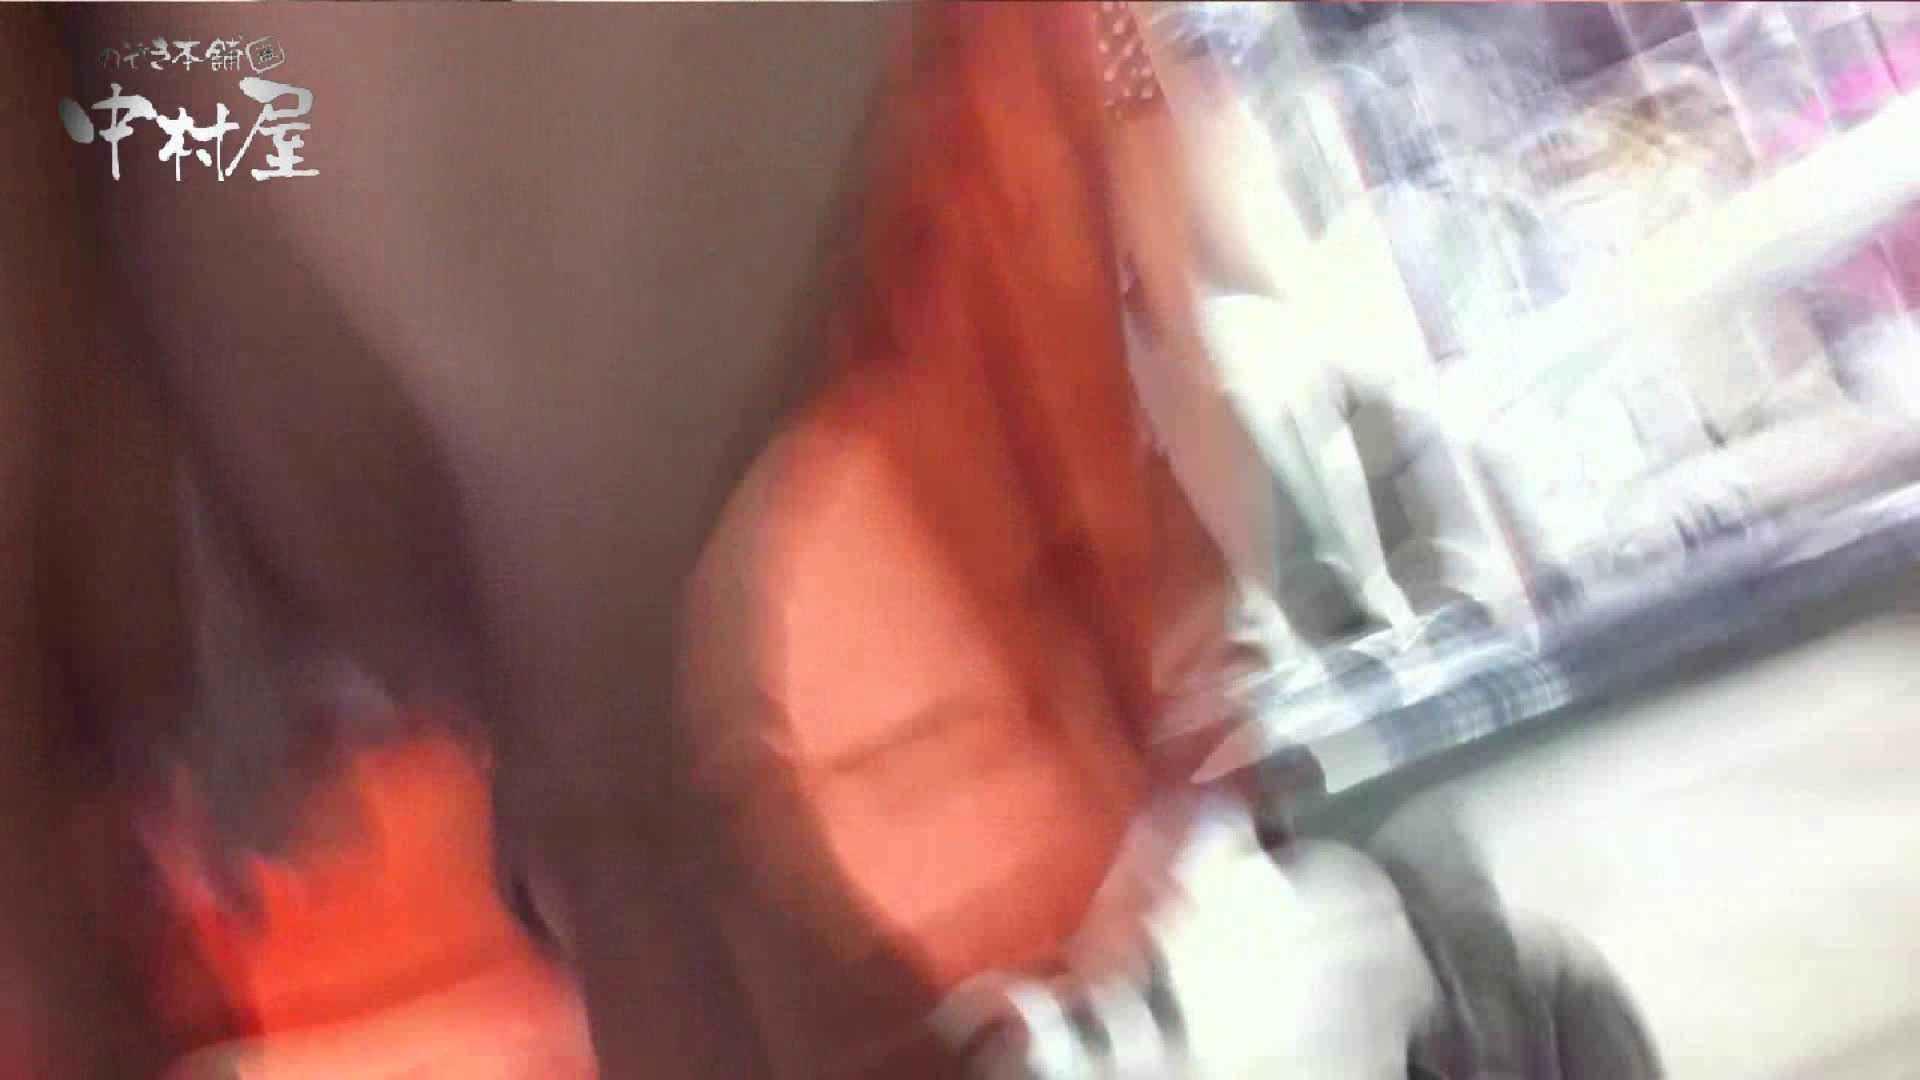 vol.44 可愛いカリスマ店員限定‼胸チラ&パンチラ はみパンねぇさん! 胸チラ   接写  104pic 56